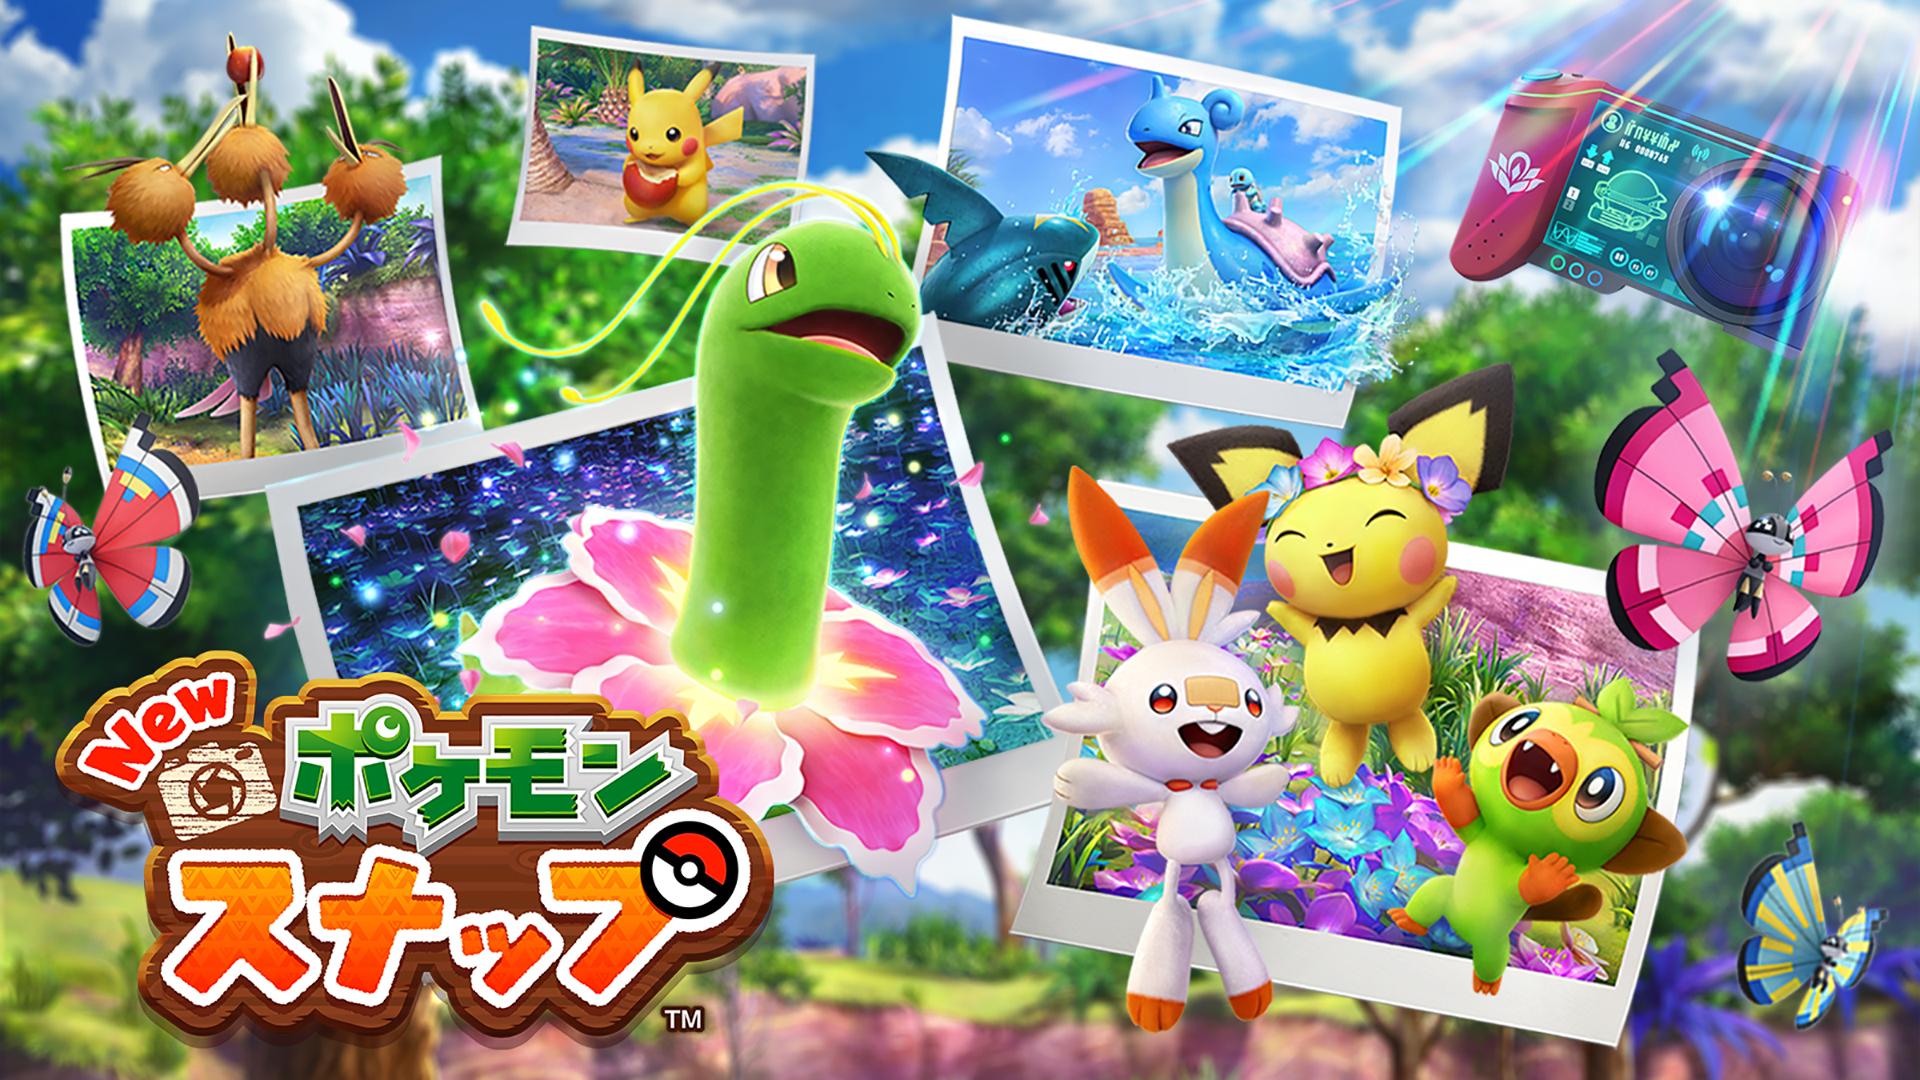 Nintendo Switchソフト「New ポケモンスナップ」4月30日発売決定&最新PV公開!未知の島での冒険が今始まる